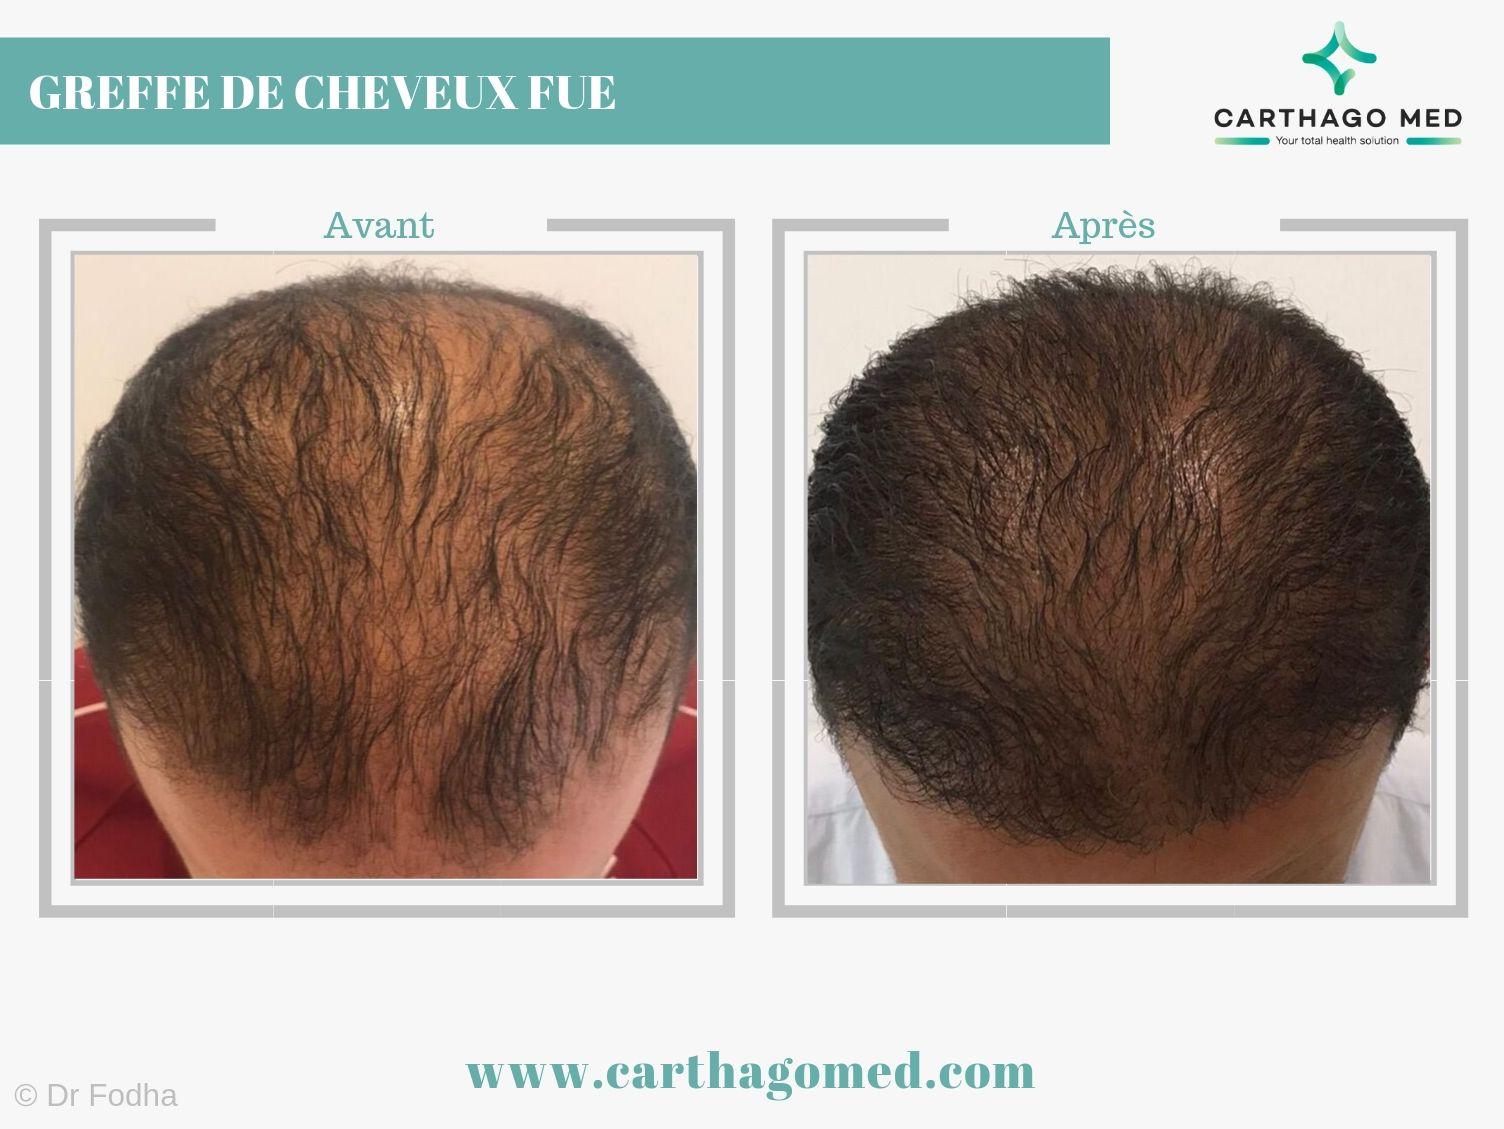 Greffe de cheveux 1 Carthago Med-min (1)